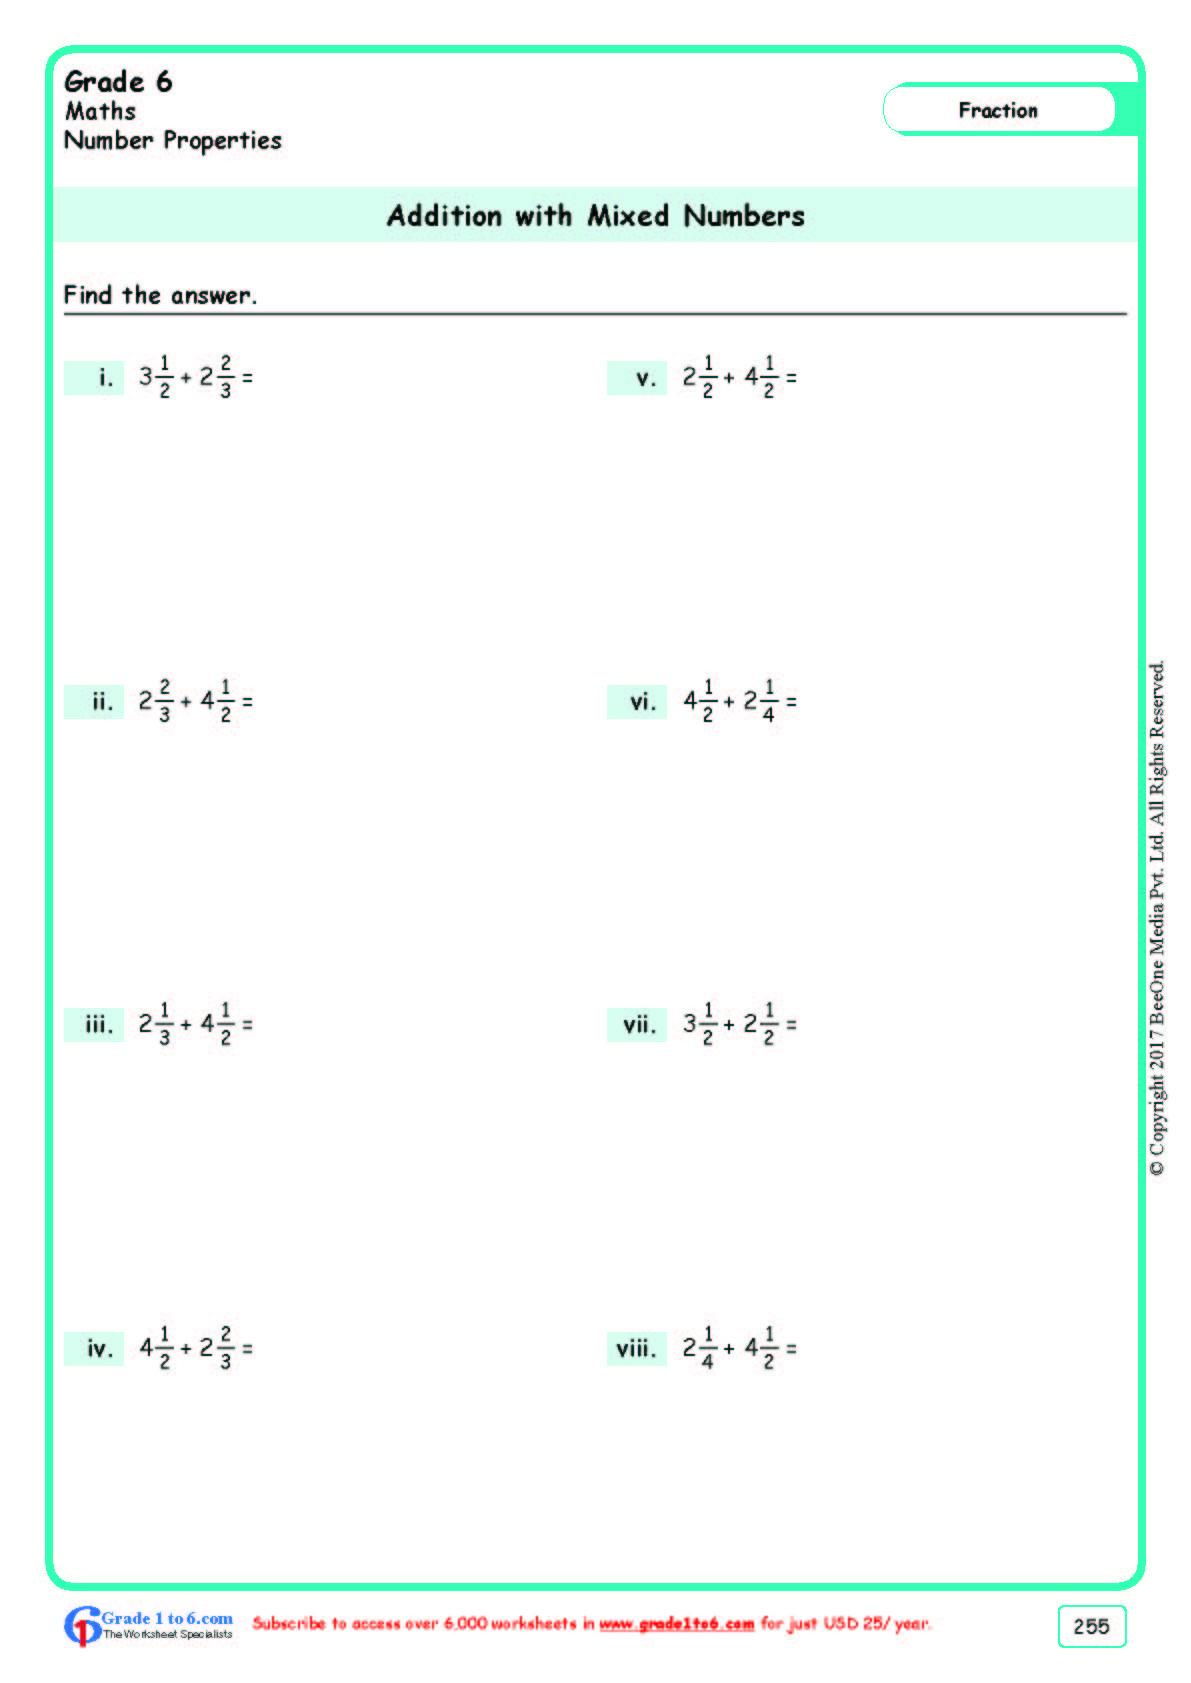 Adding Mixed Numbers Worksheet Grade 6 Class Six Adding Mixed Numbers Worksheets